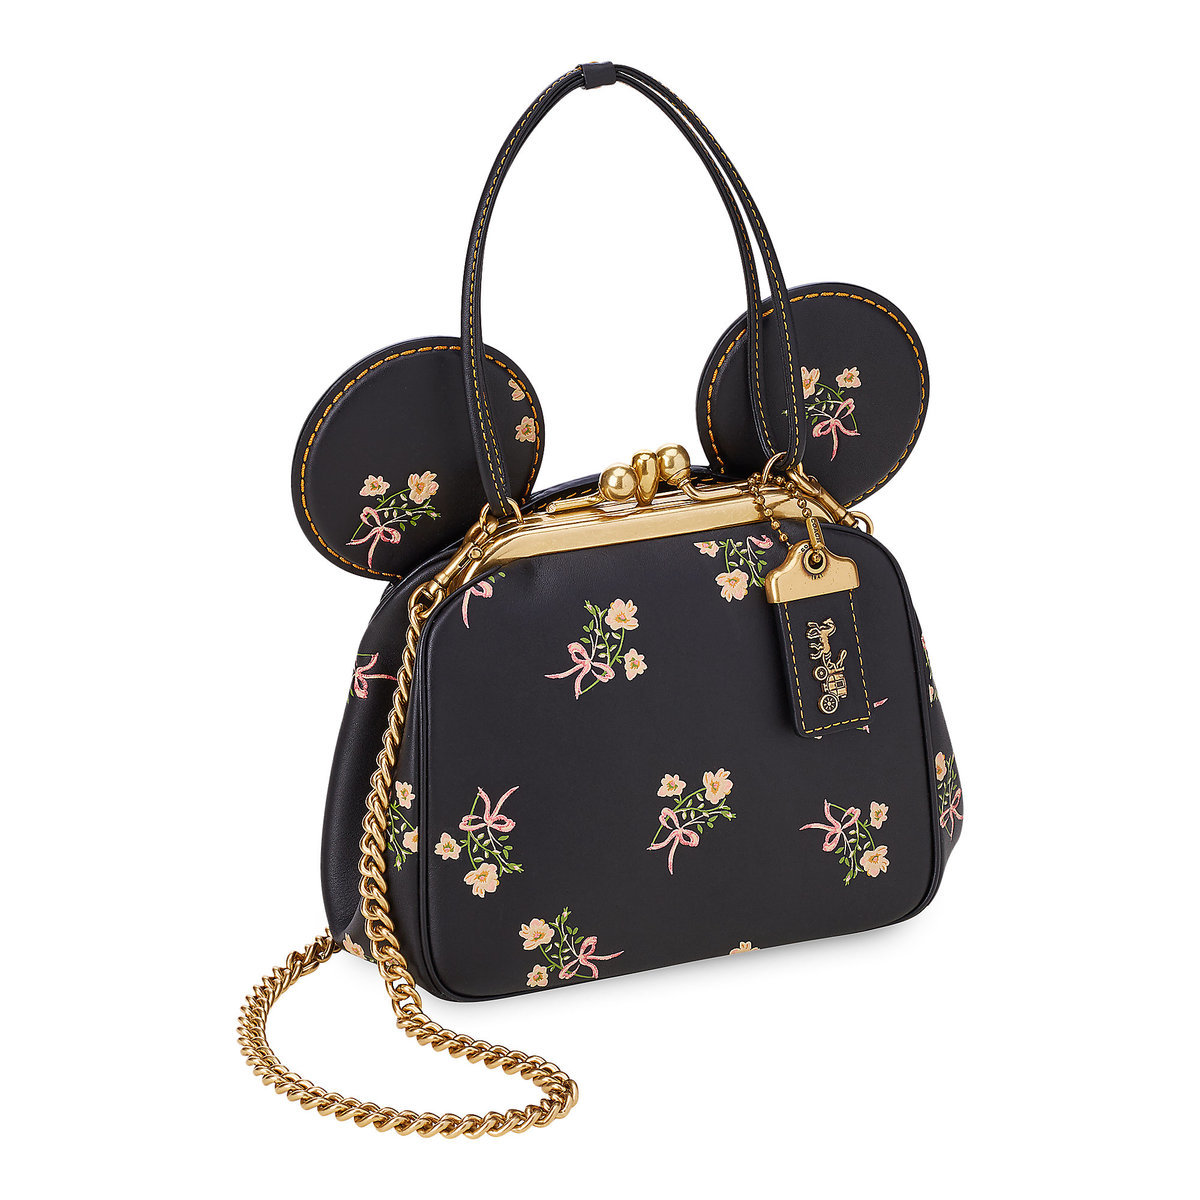 6e55665a880 Minnie Mouse Floral Kisslock Leather Bag by COACH - Black